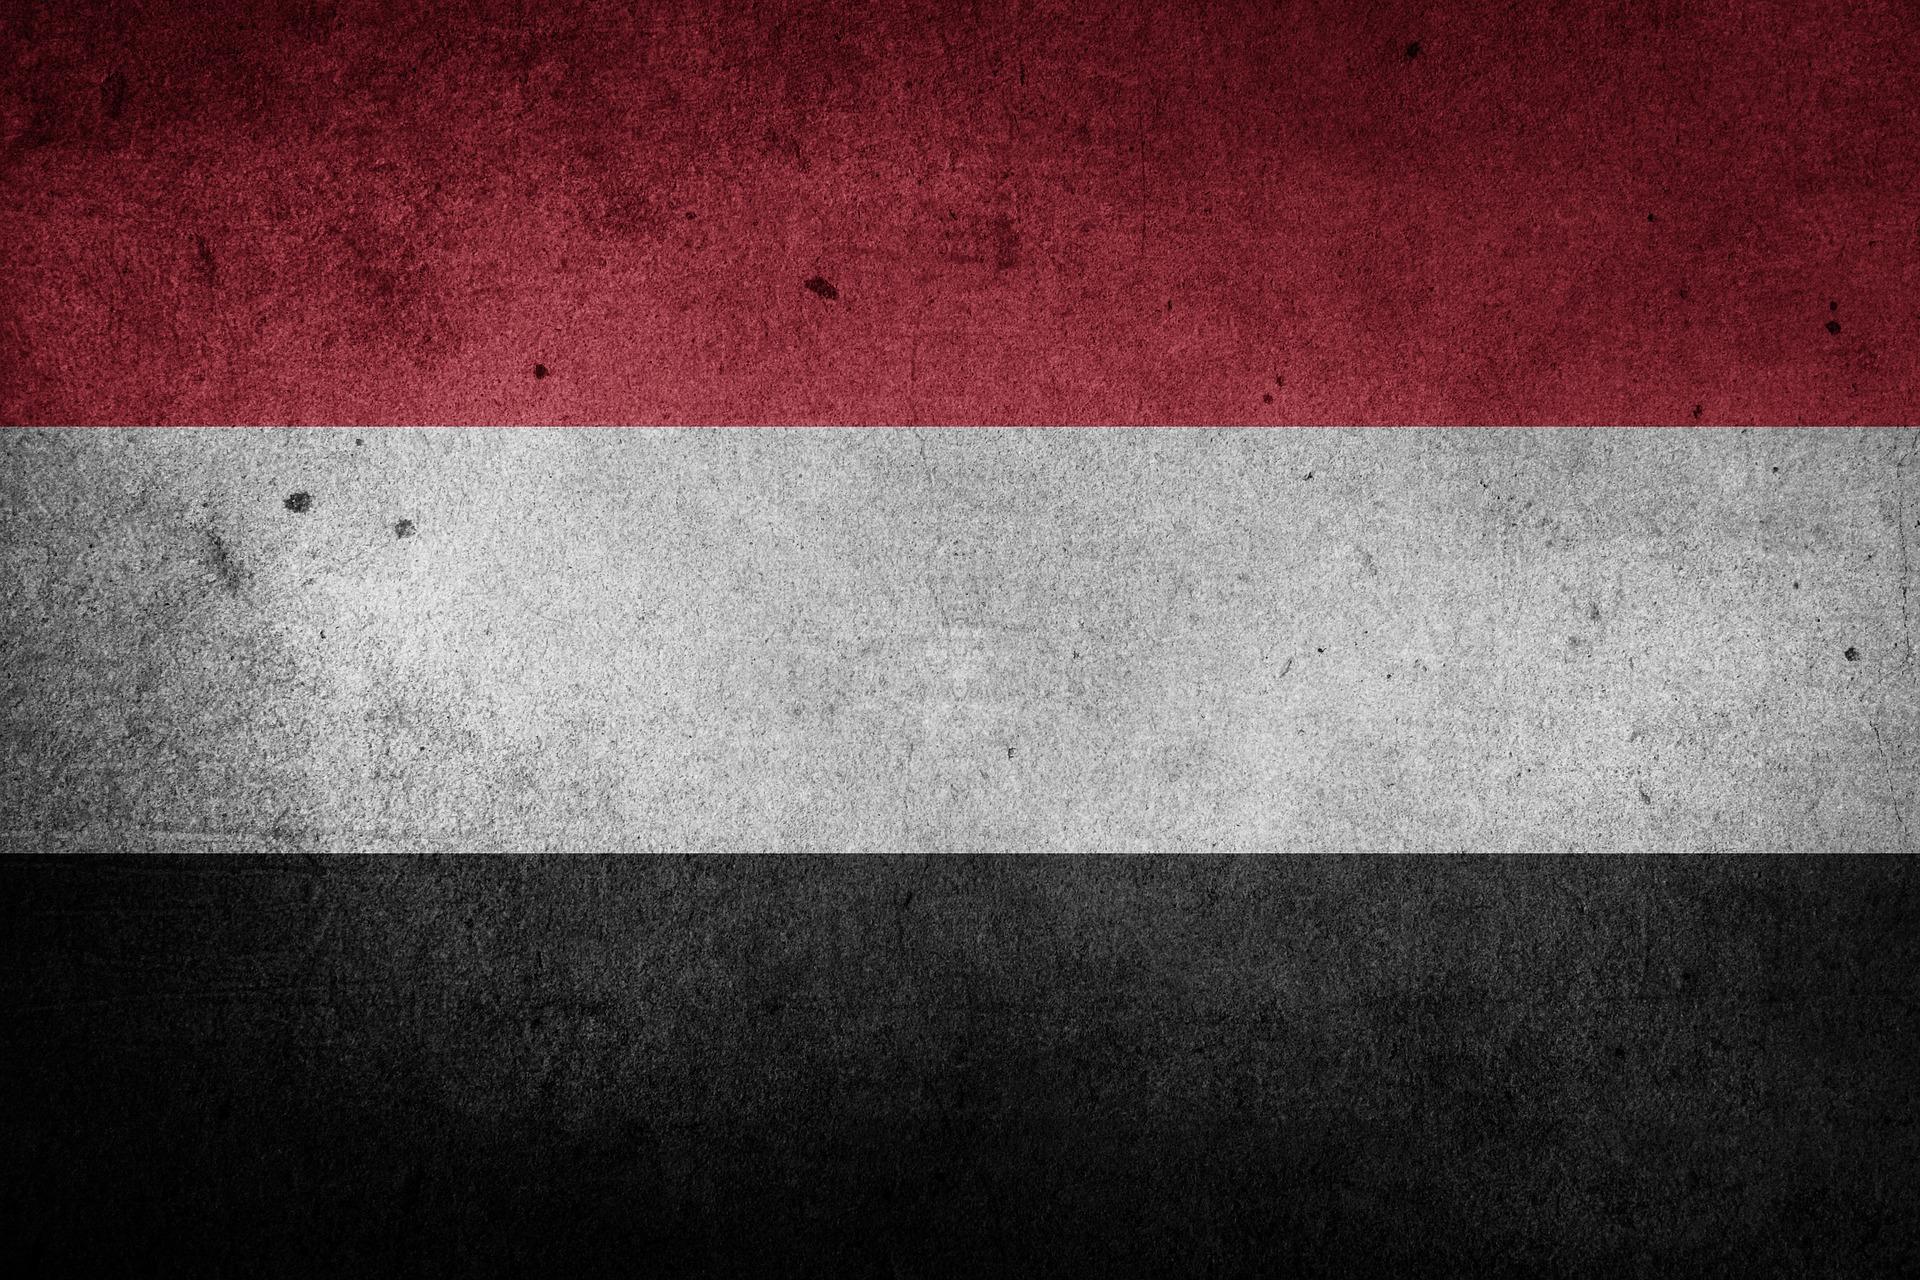 Yemen approaching famine status